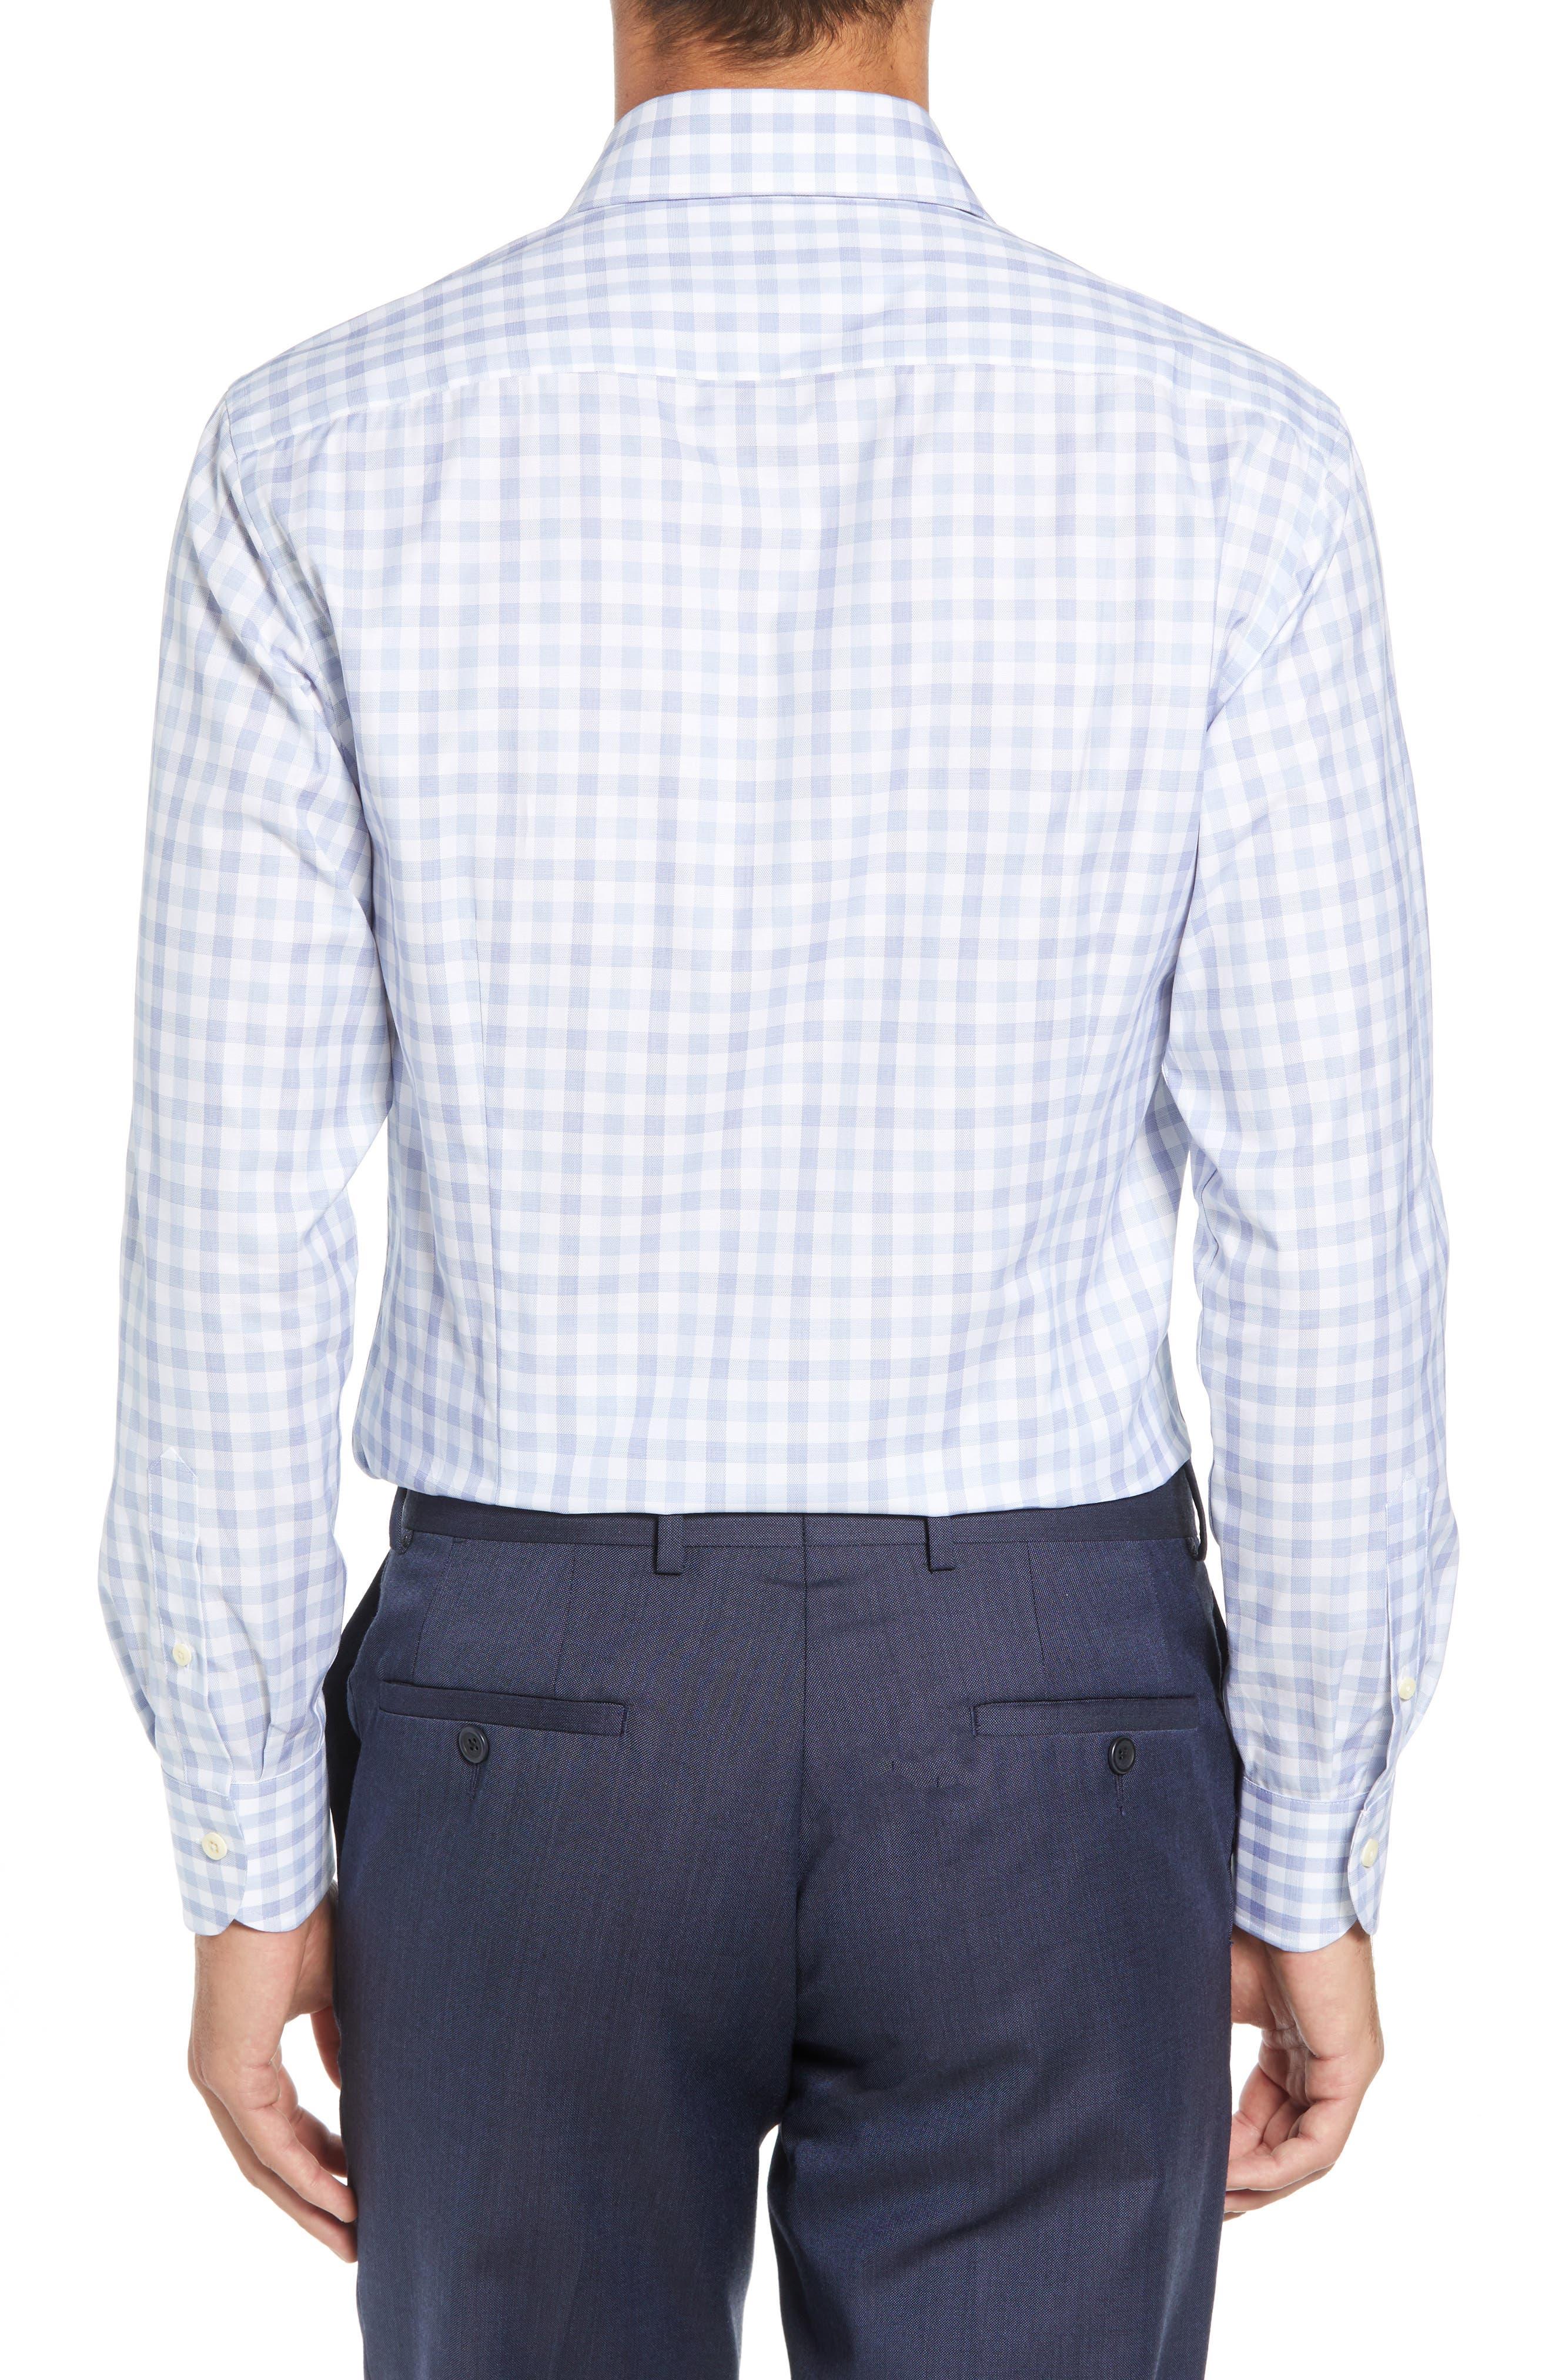 Corbly Trim Fit Check Dress Shirt,                             Alternate thumbnail 3, color,                             LIGHT BLUE